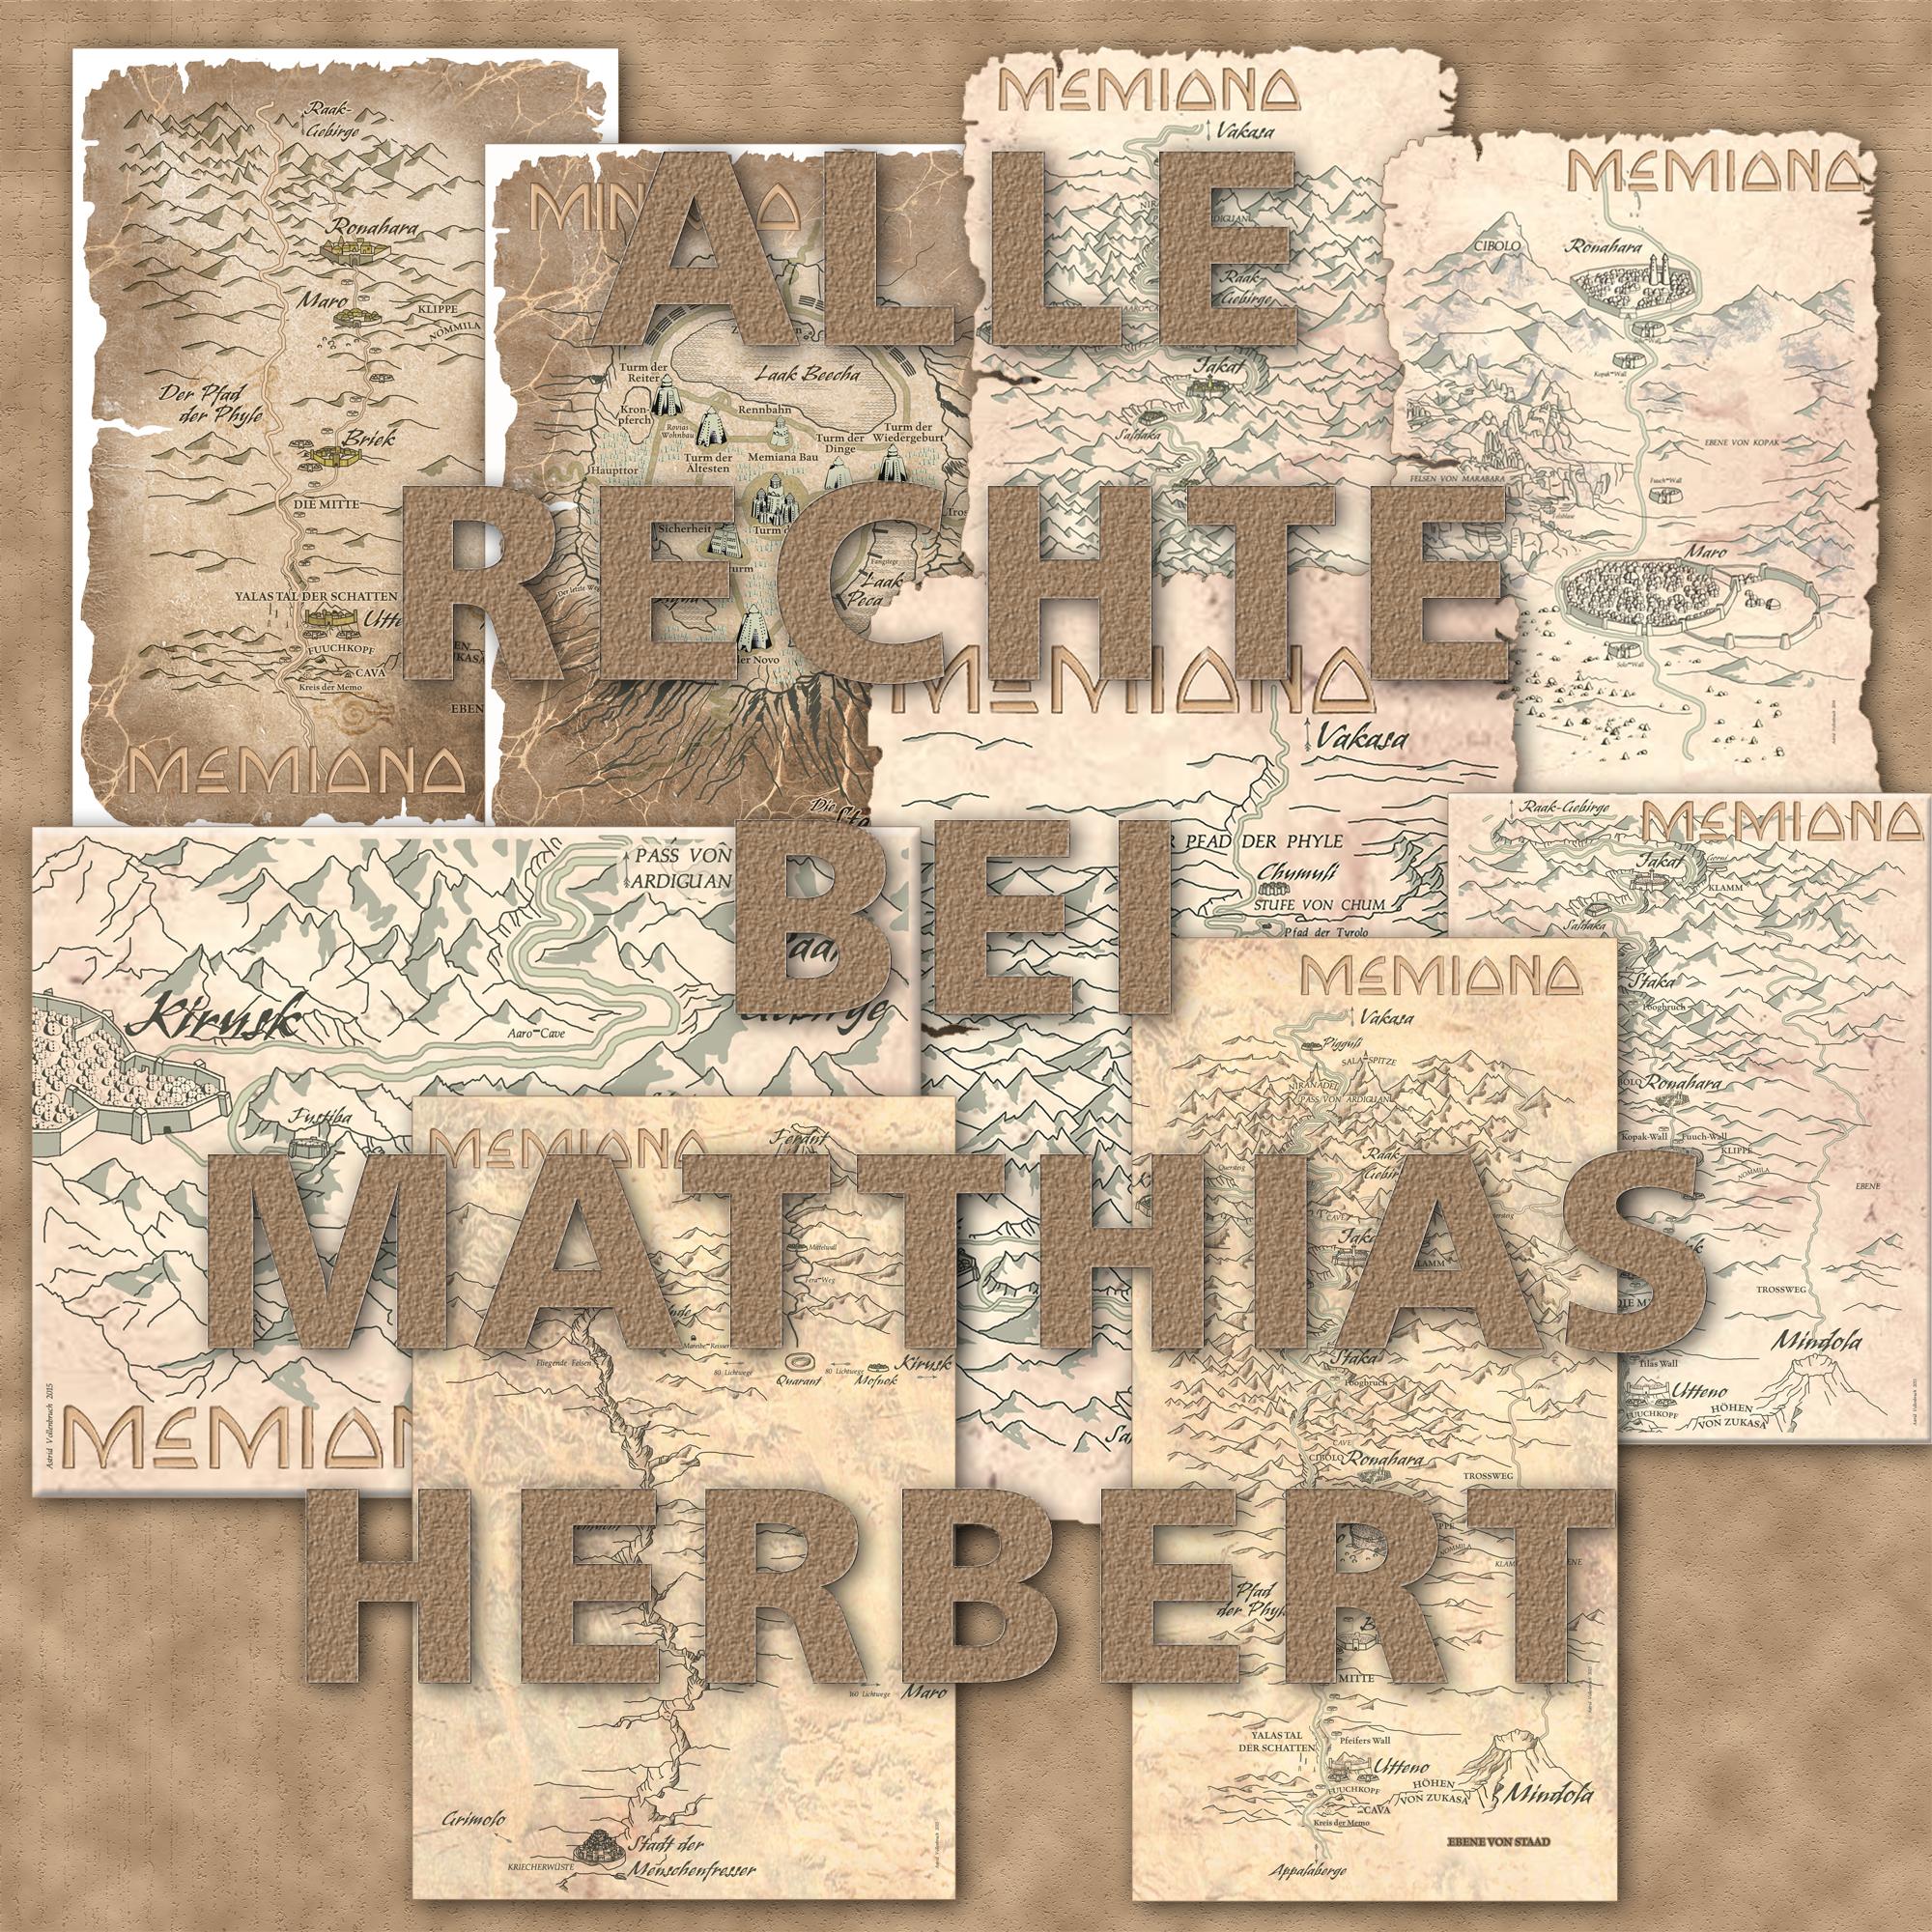 Memiana - Matthias Herbert